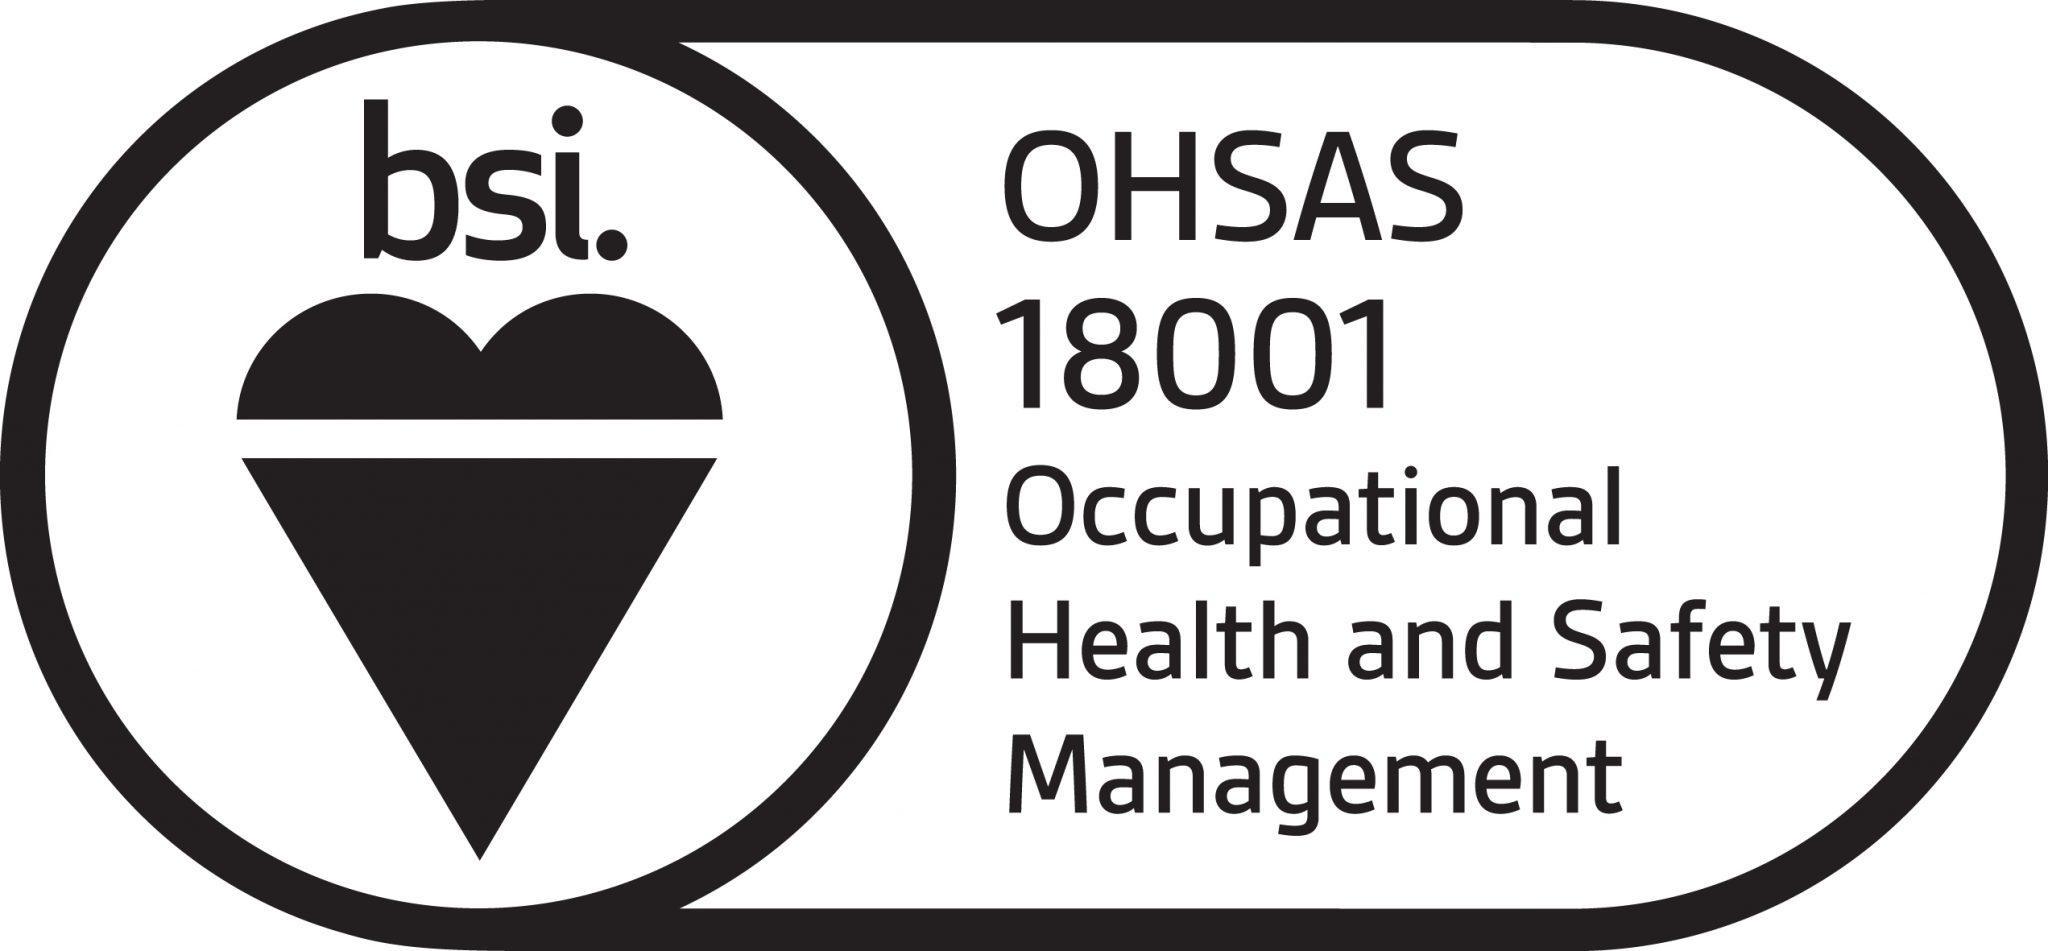 BSI-Assurance-Mark-OHS-18001-KEYB.jpg